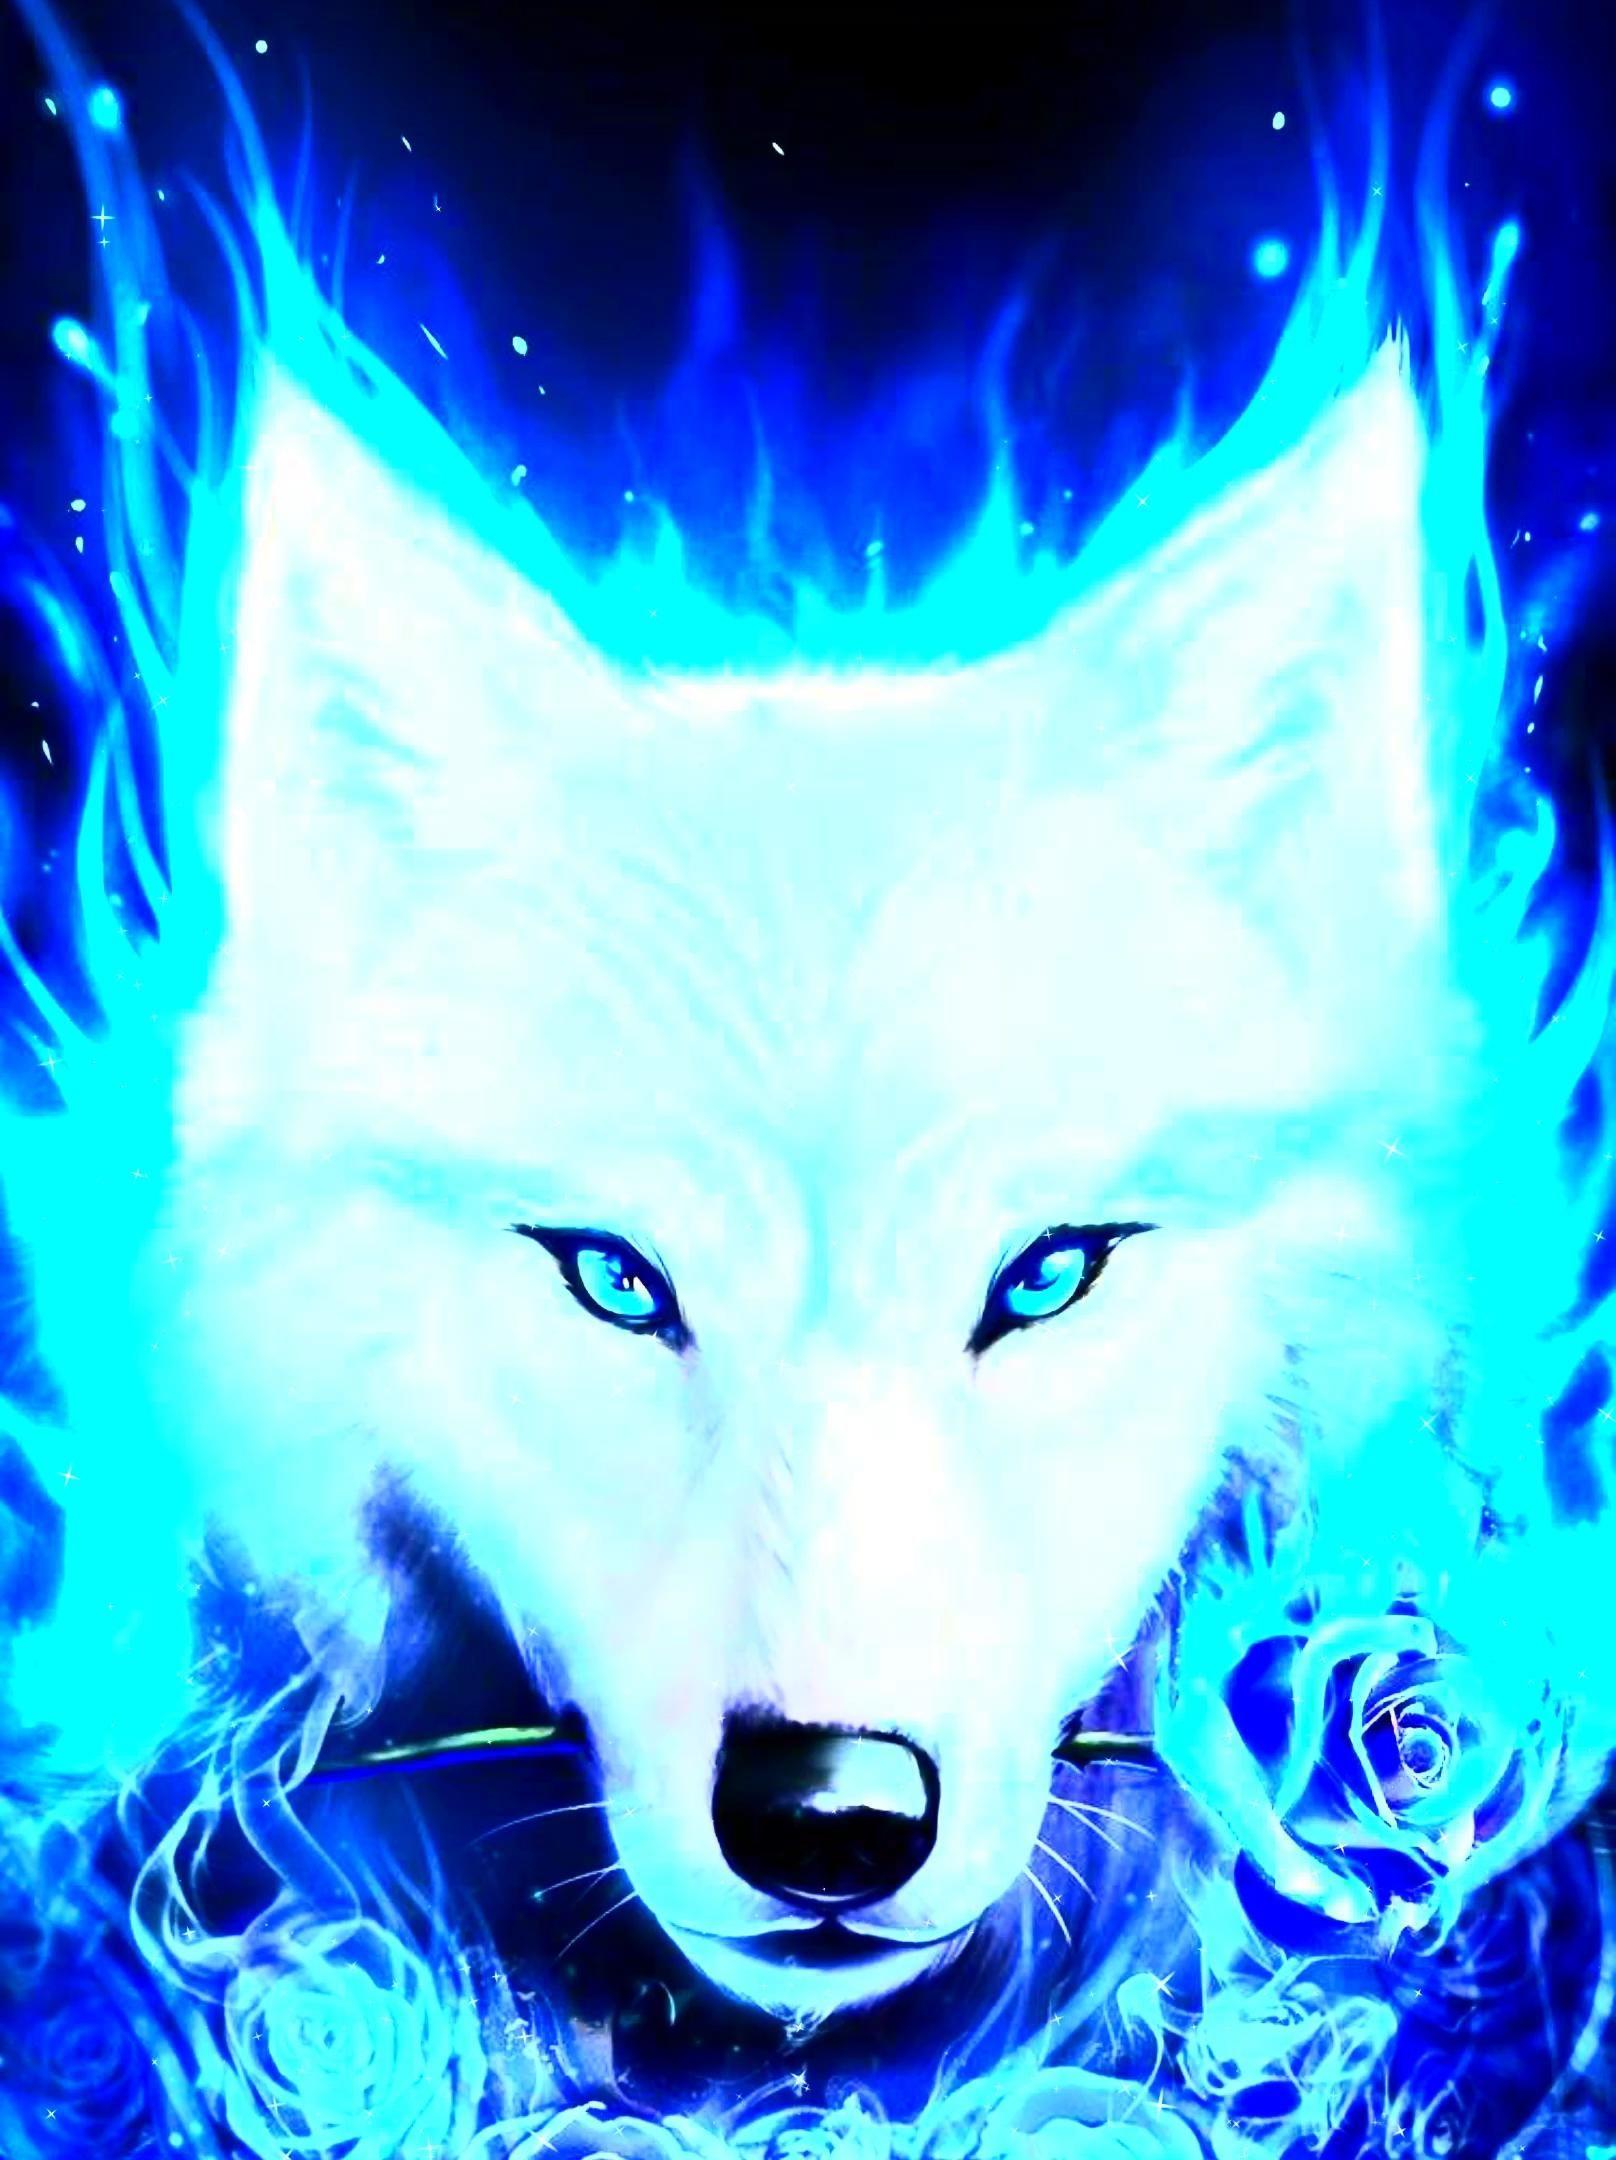 Pin By Digital Art Alive On 2020 Digital Art Video Wolf Spirit Animal Spirit Animal Art Wolf Wallpaper